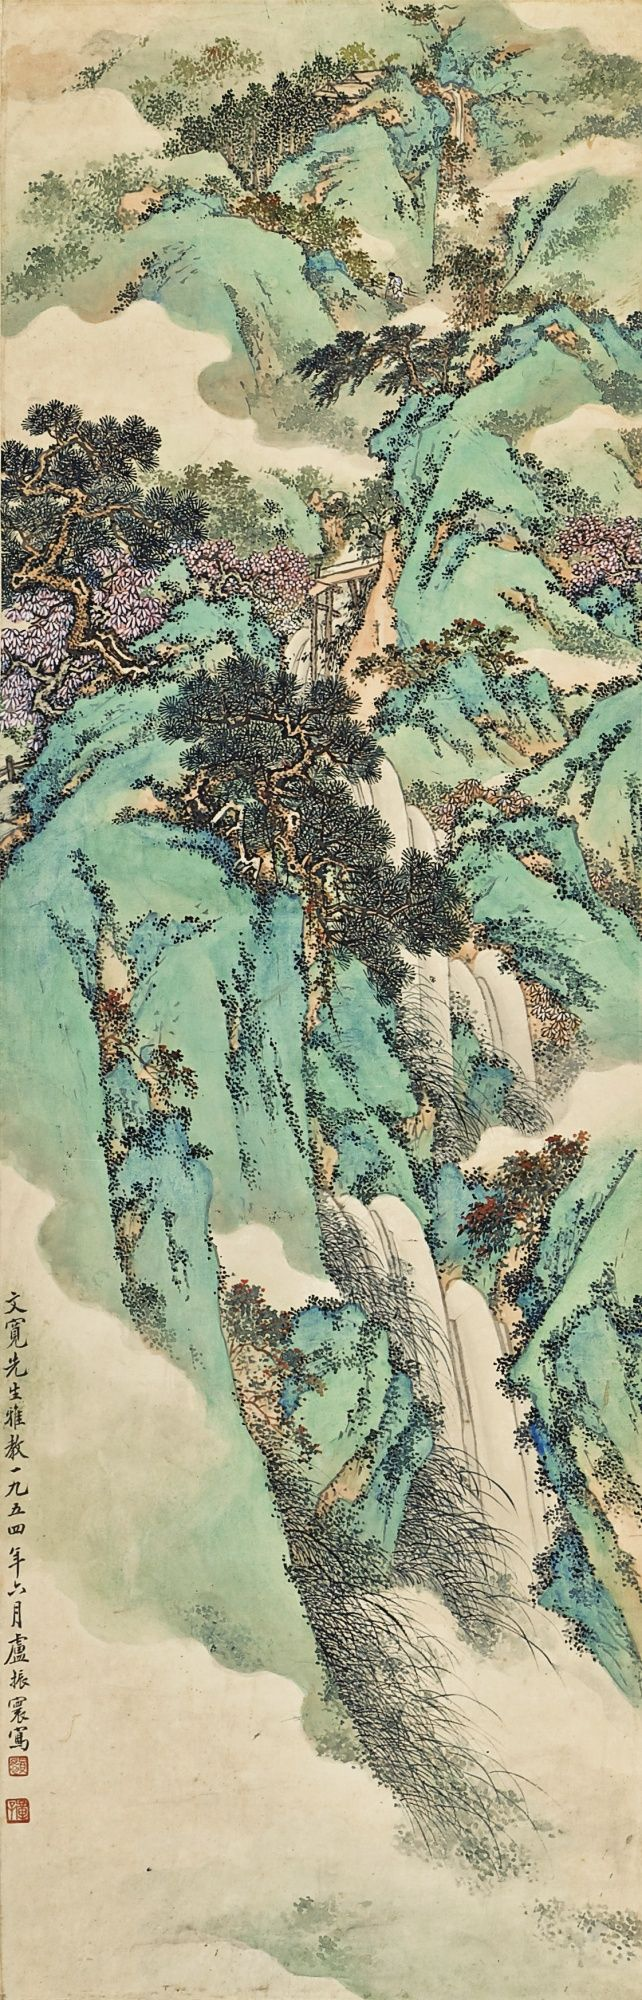 RUNNING STREAMS IN VERDANT RAVINES by LU ZHENHUAN (1889-1979), Lot | Sotheby's